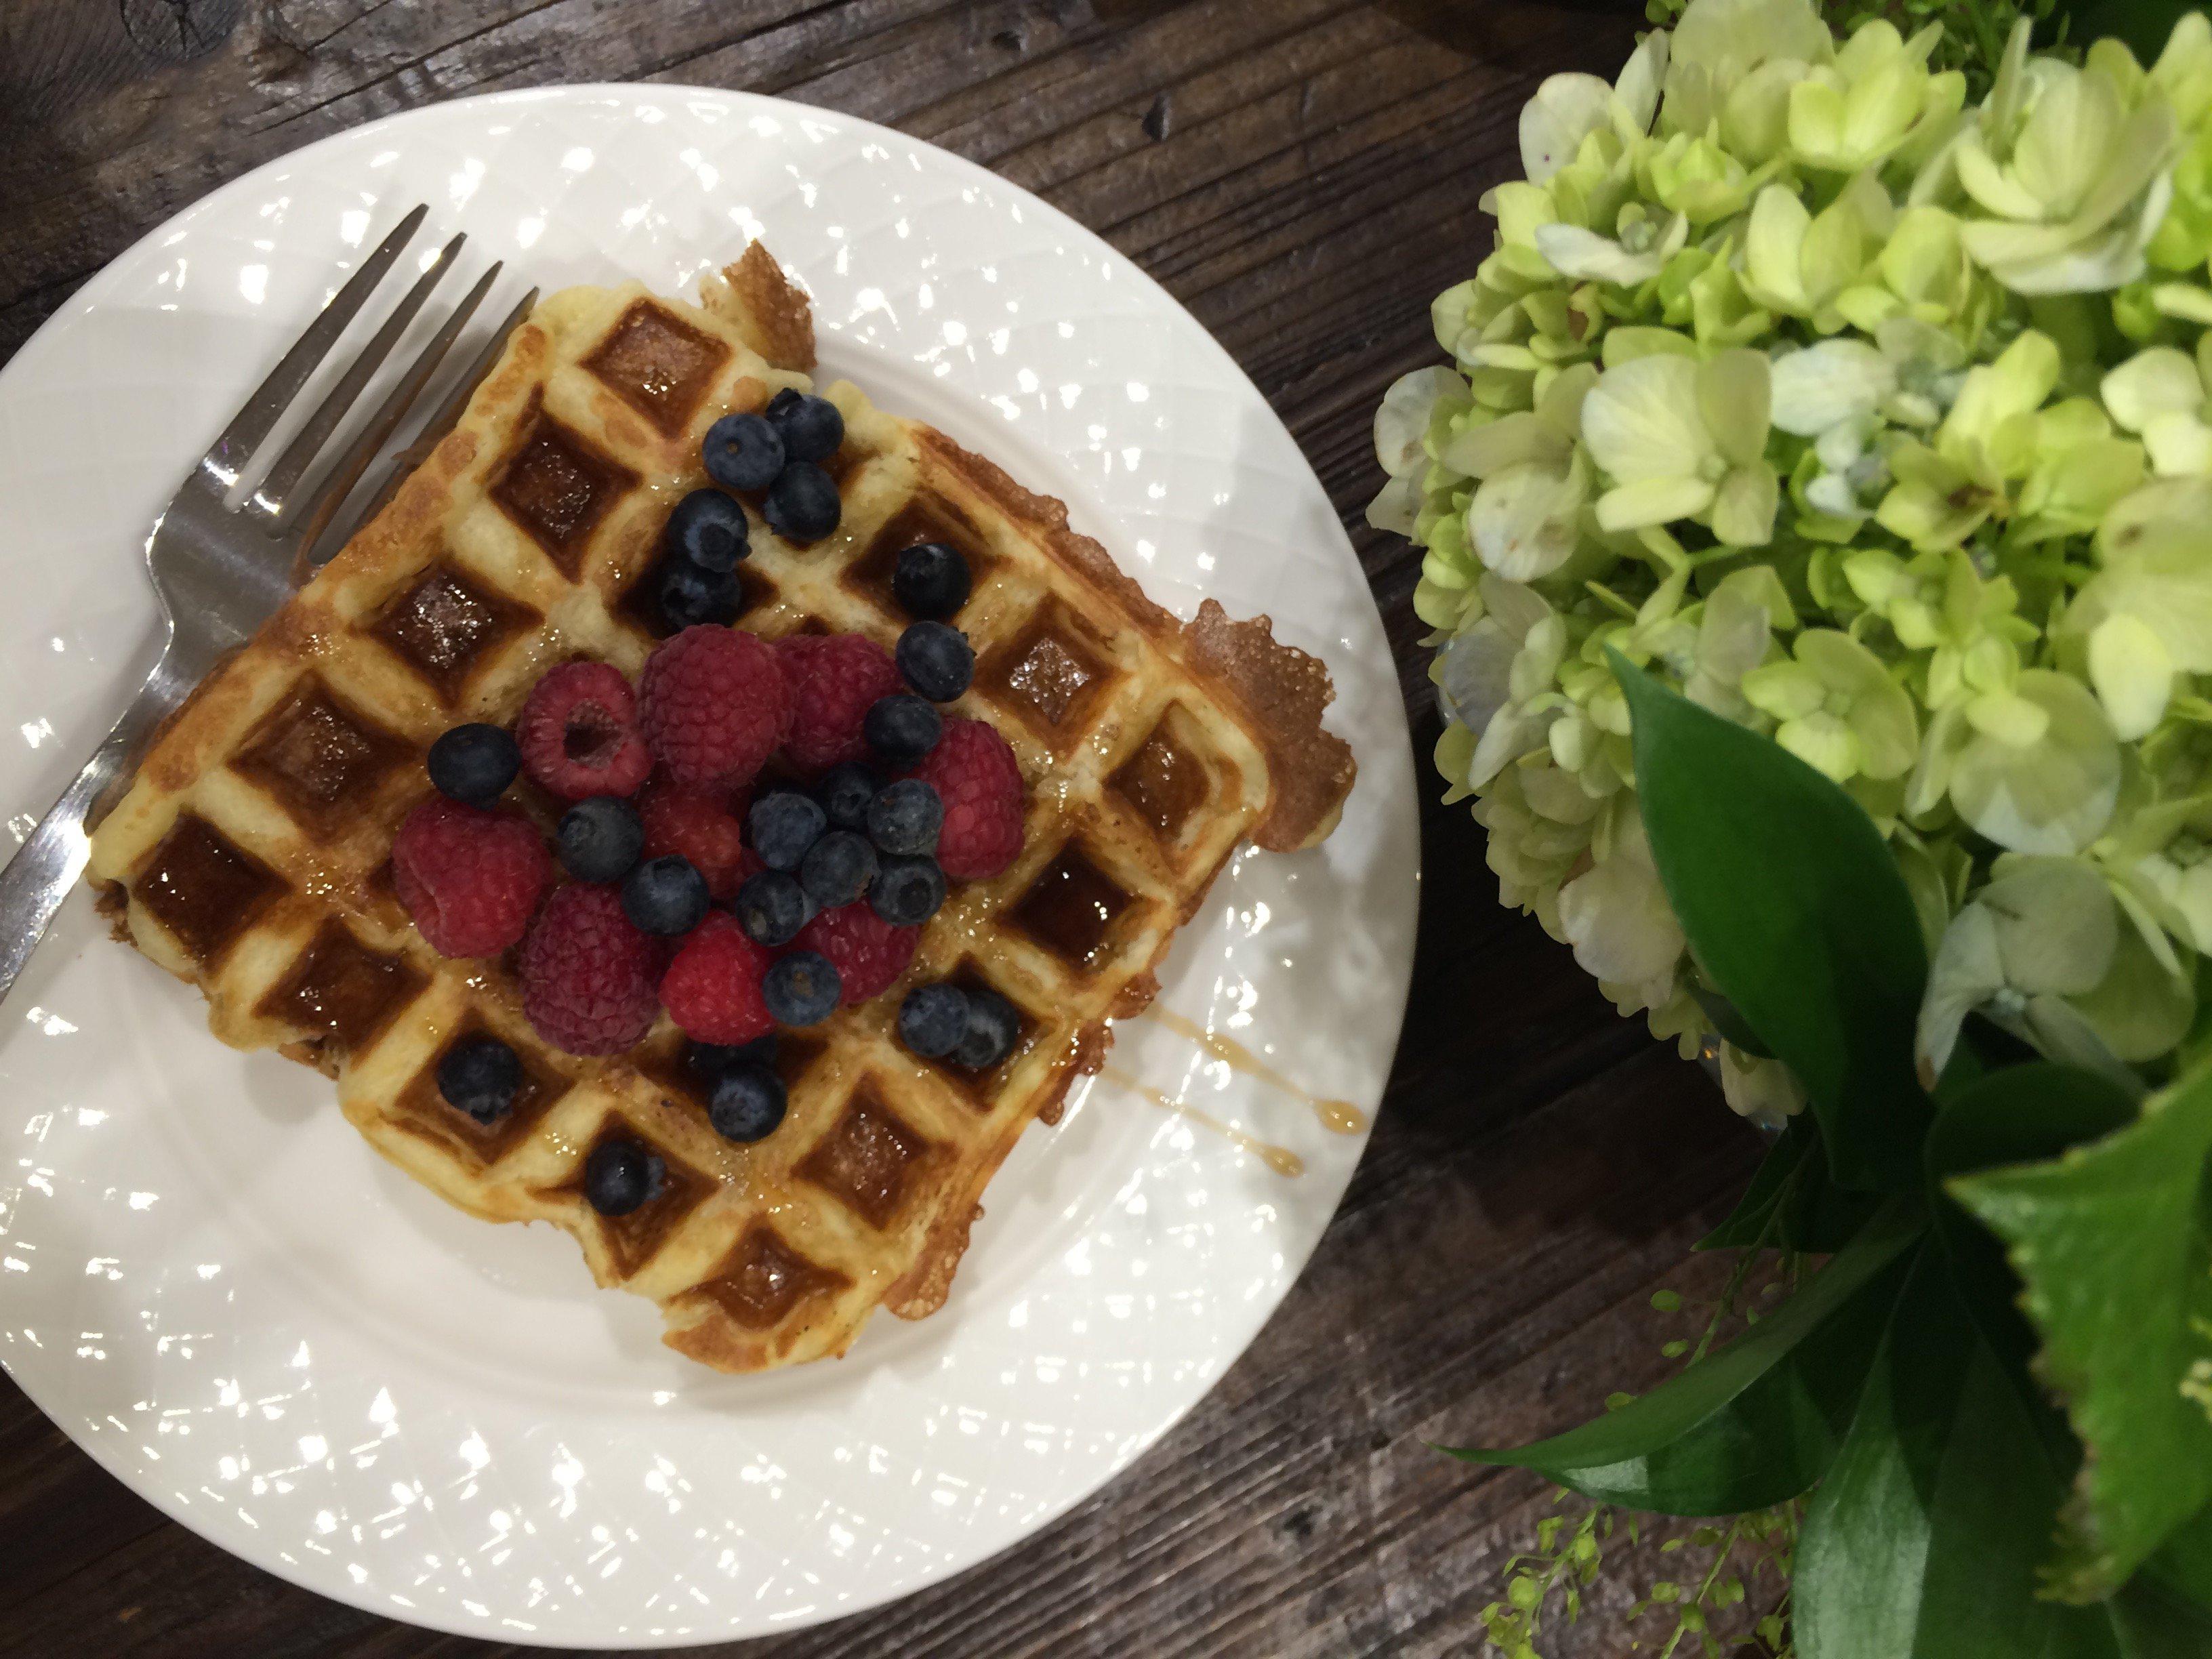 williams-sonoma waffles